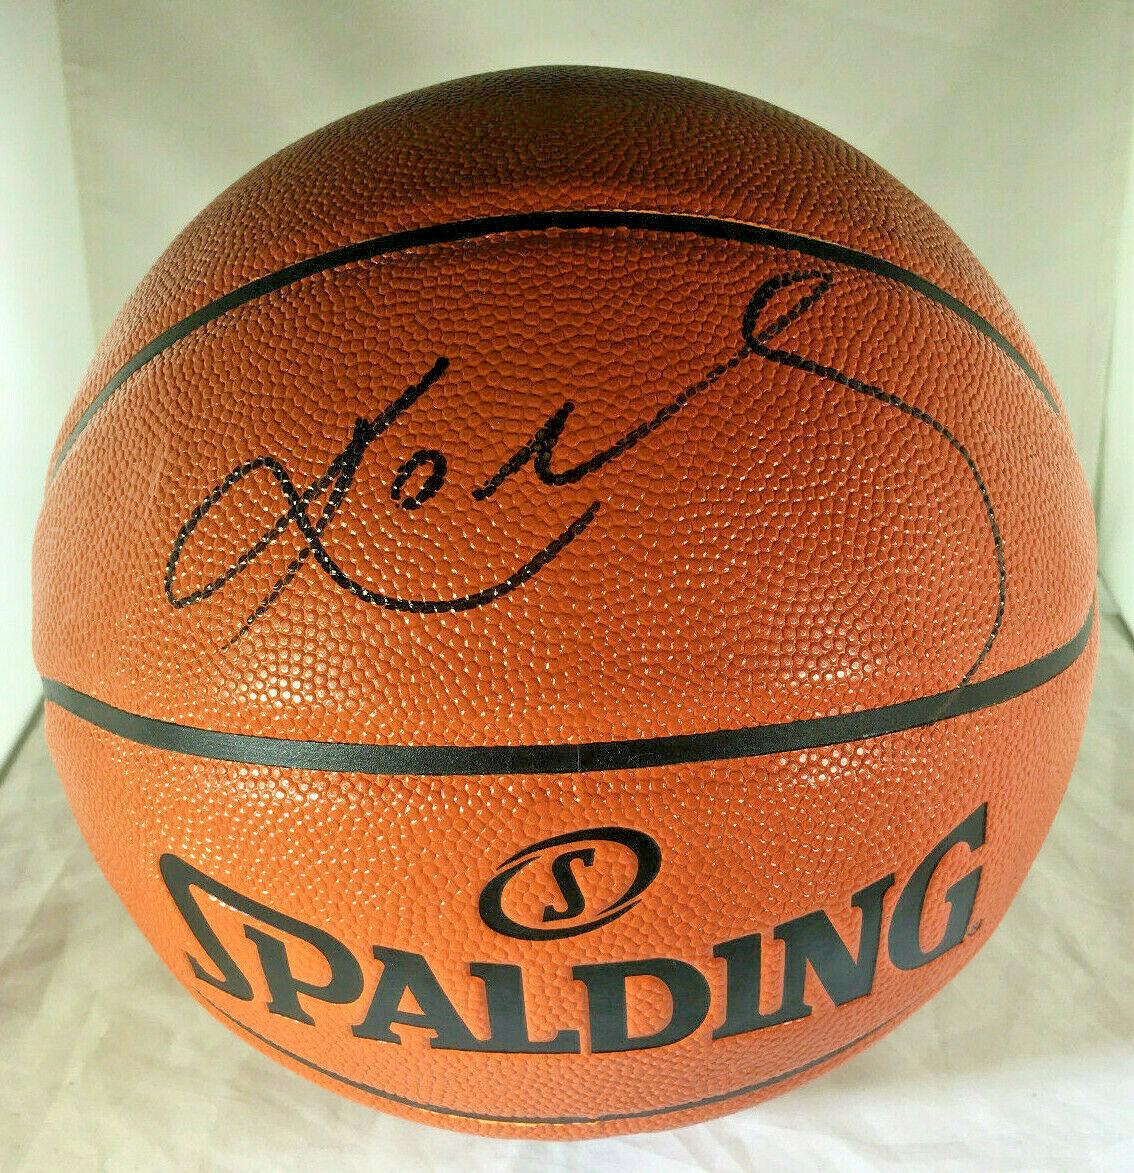 KOBE BRYANT / NBA HALL OF FAME / AUTOGRAPHED NBA LOGO SPALDING BASKETBALL / COA